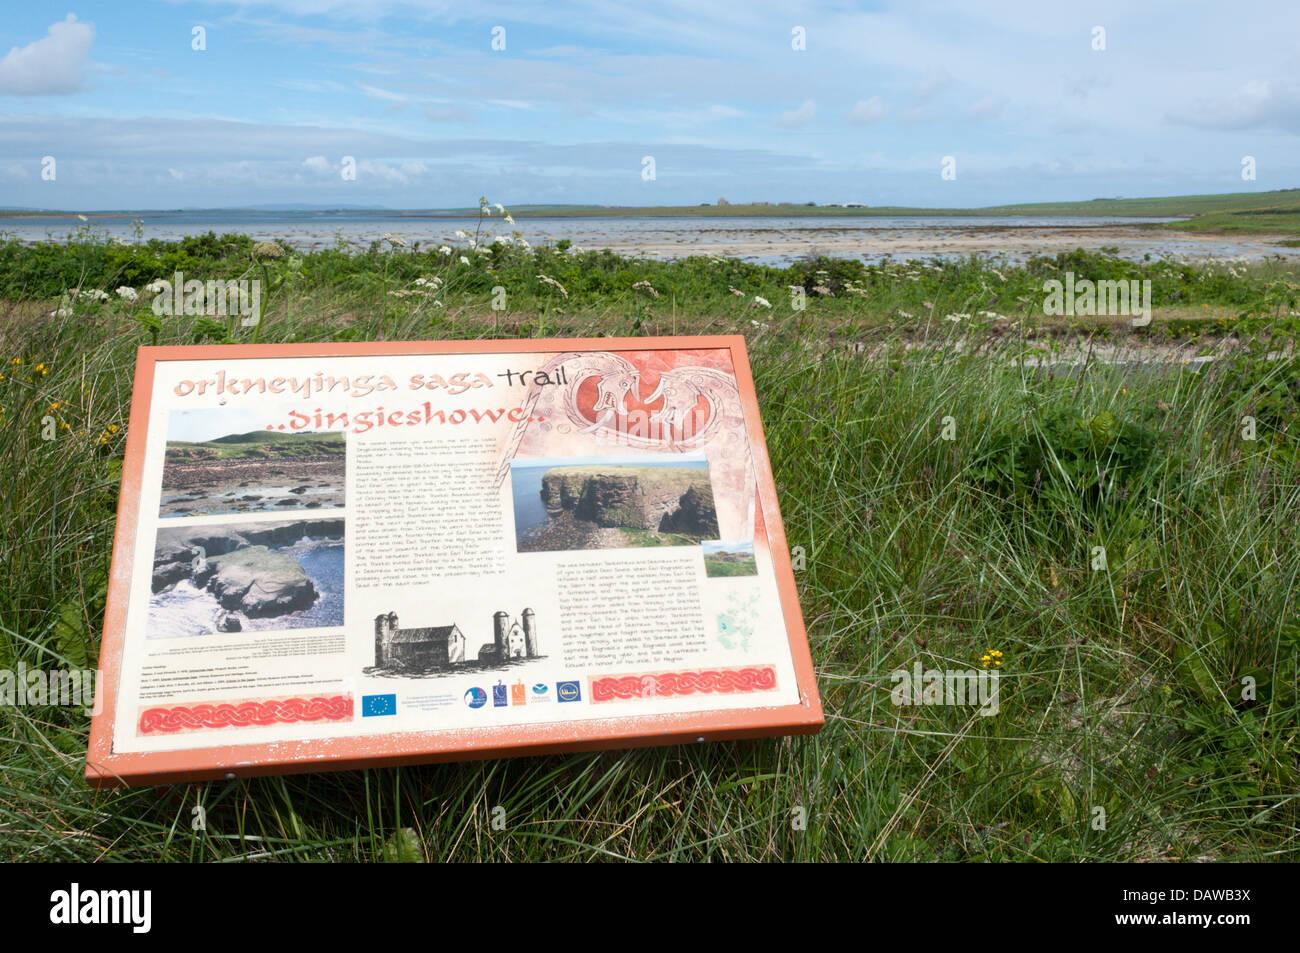 An interpretative sign for the Orkneyinga Saga Trail on Deerness, Mainland Orkney. - Stock Image